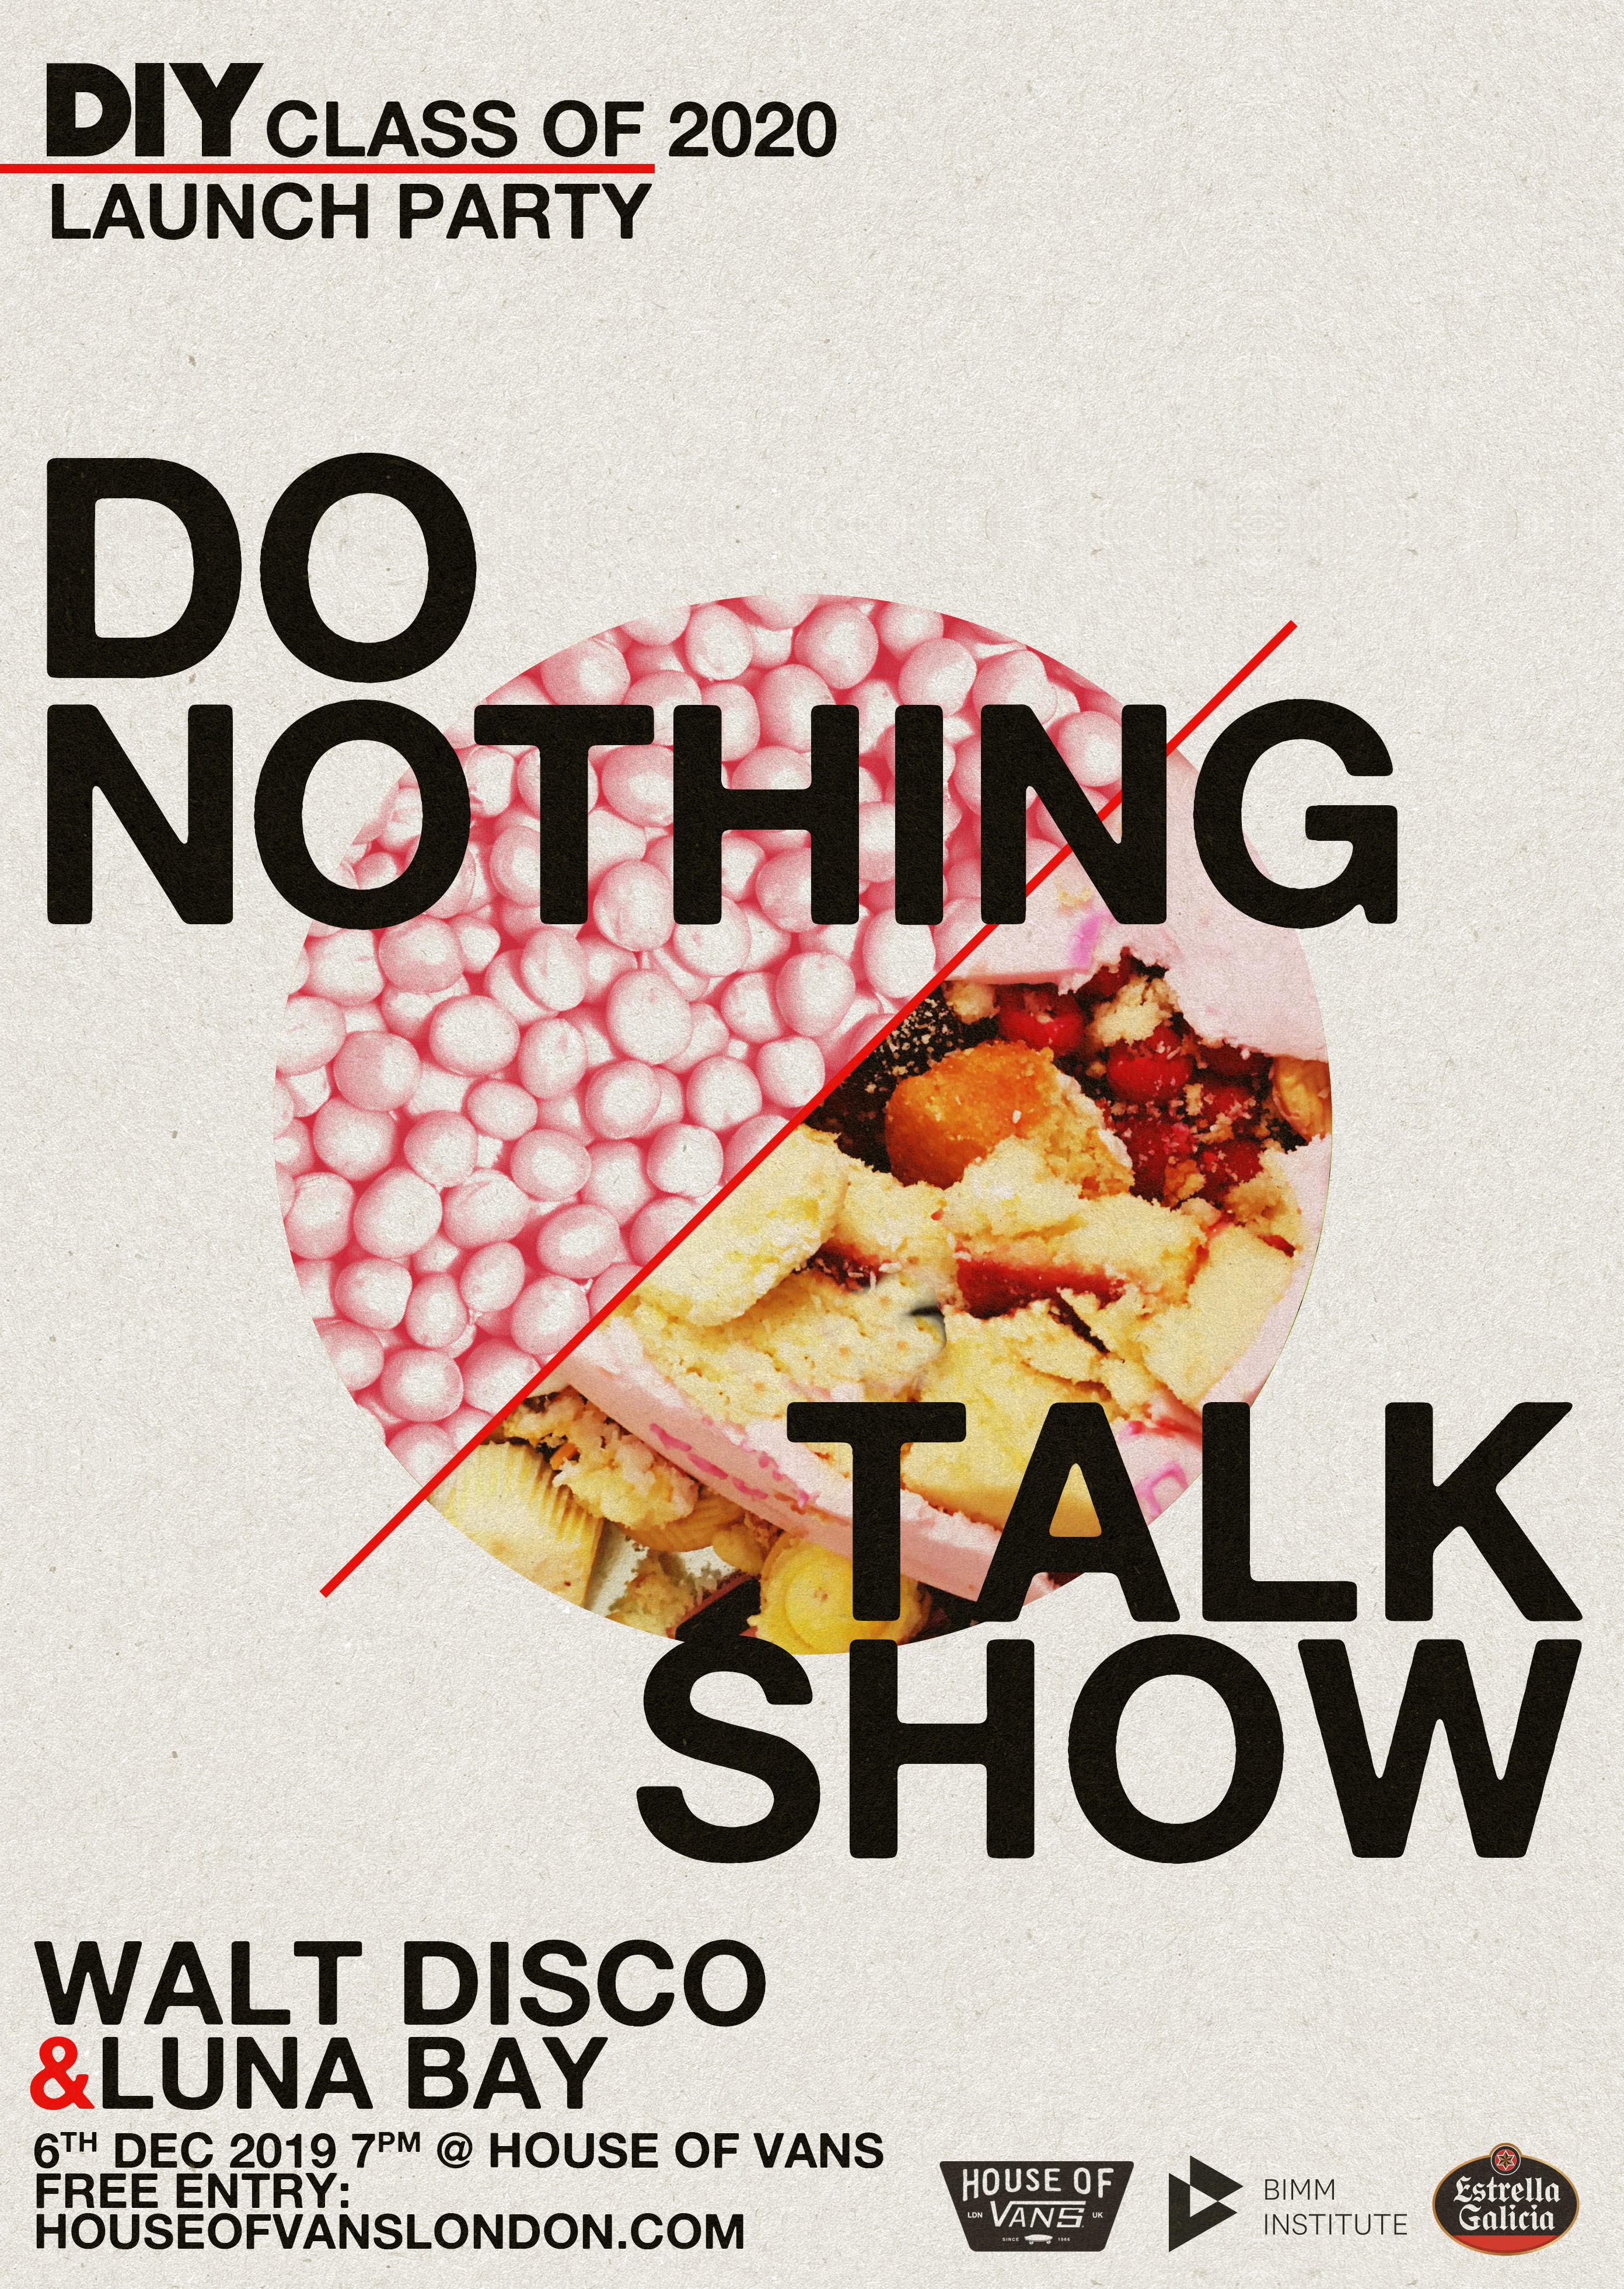 Do Nothing, Talk Show & Walt Disco to play DIY's Class of 2020 launch show!